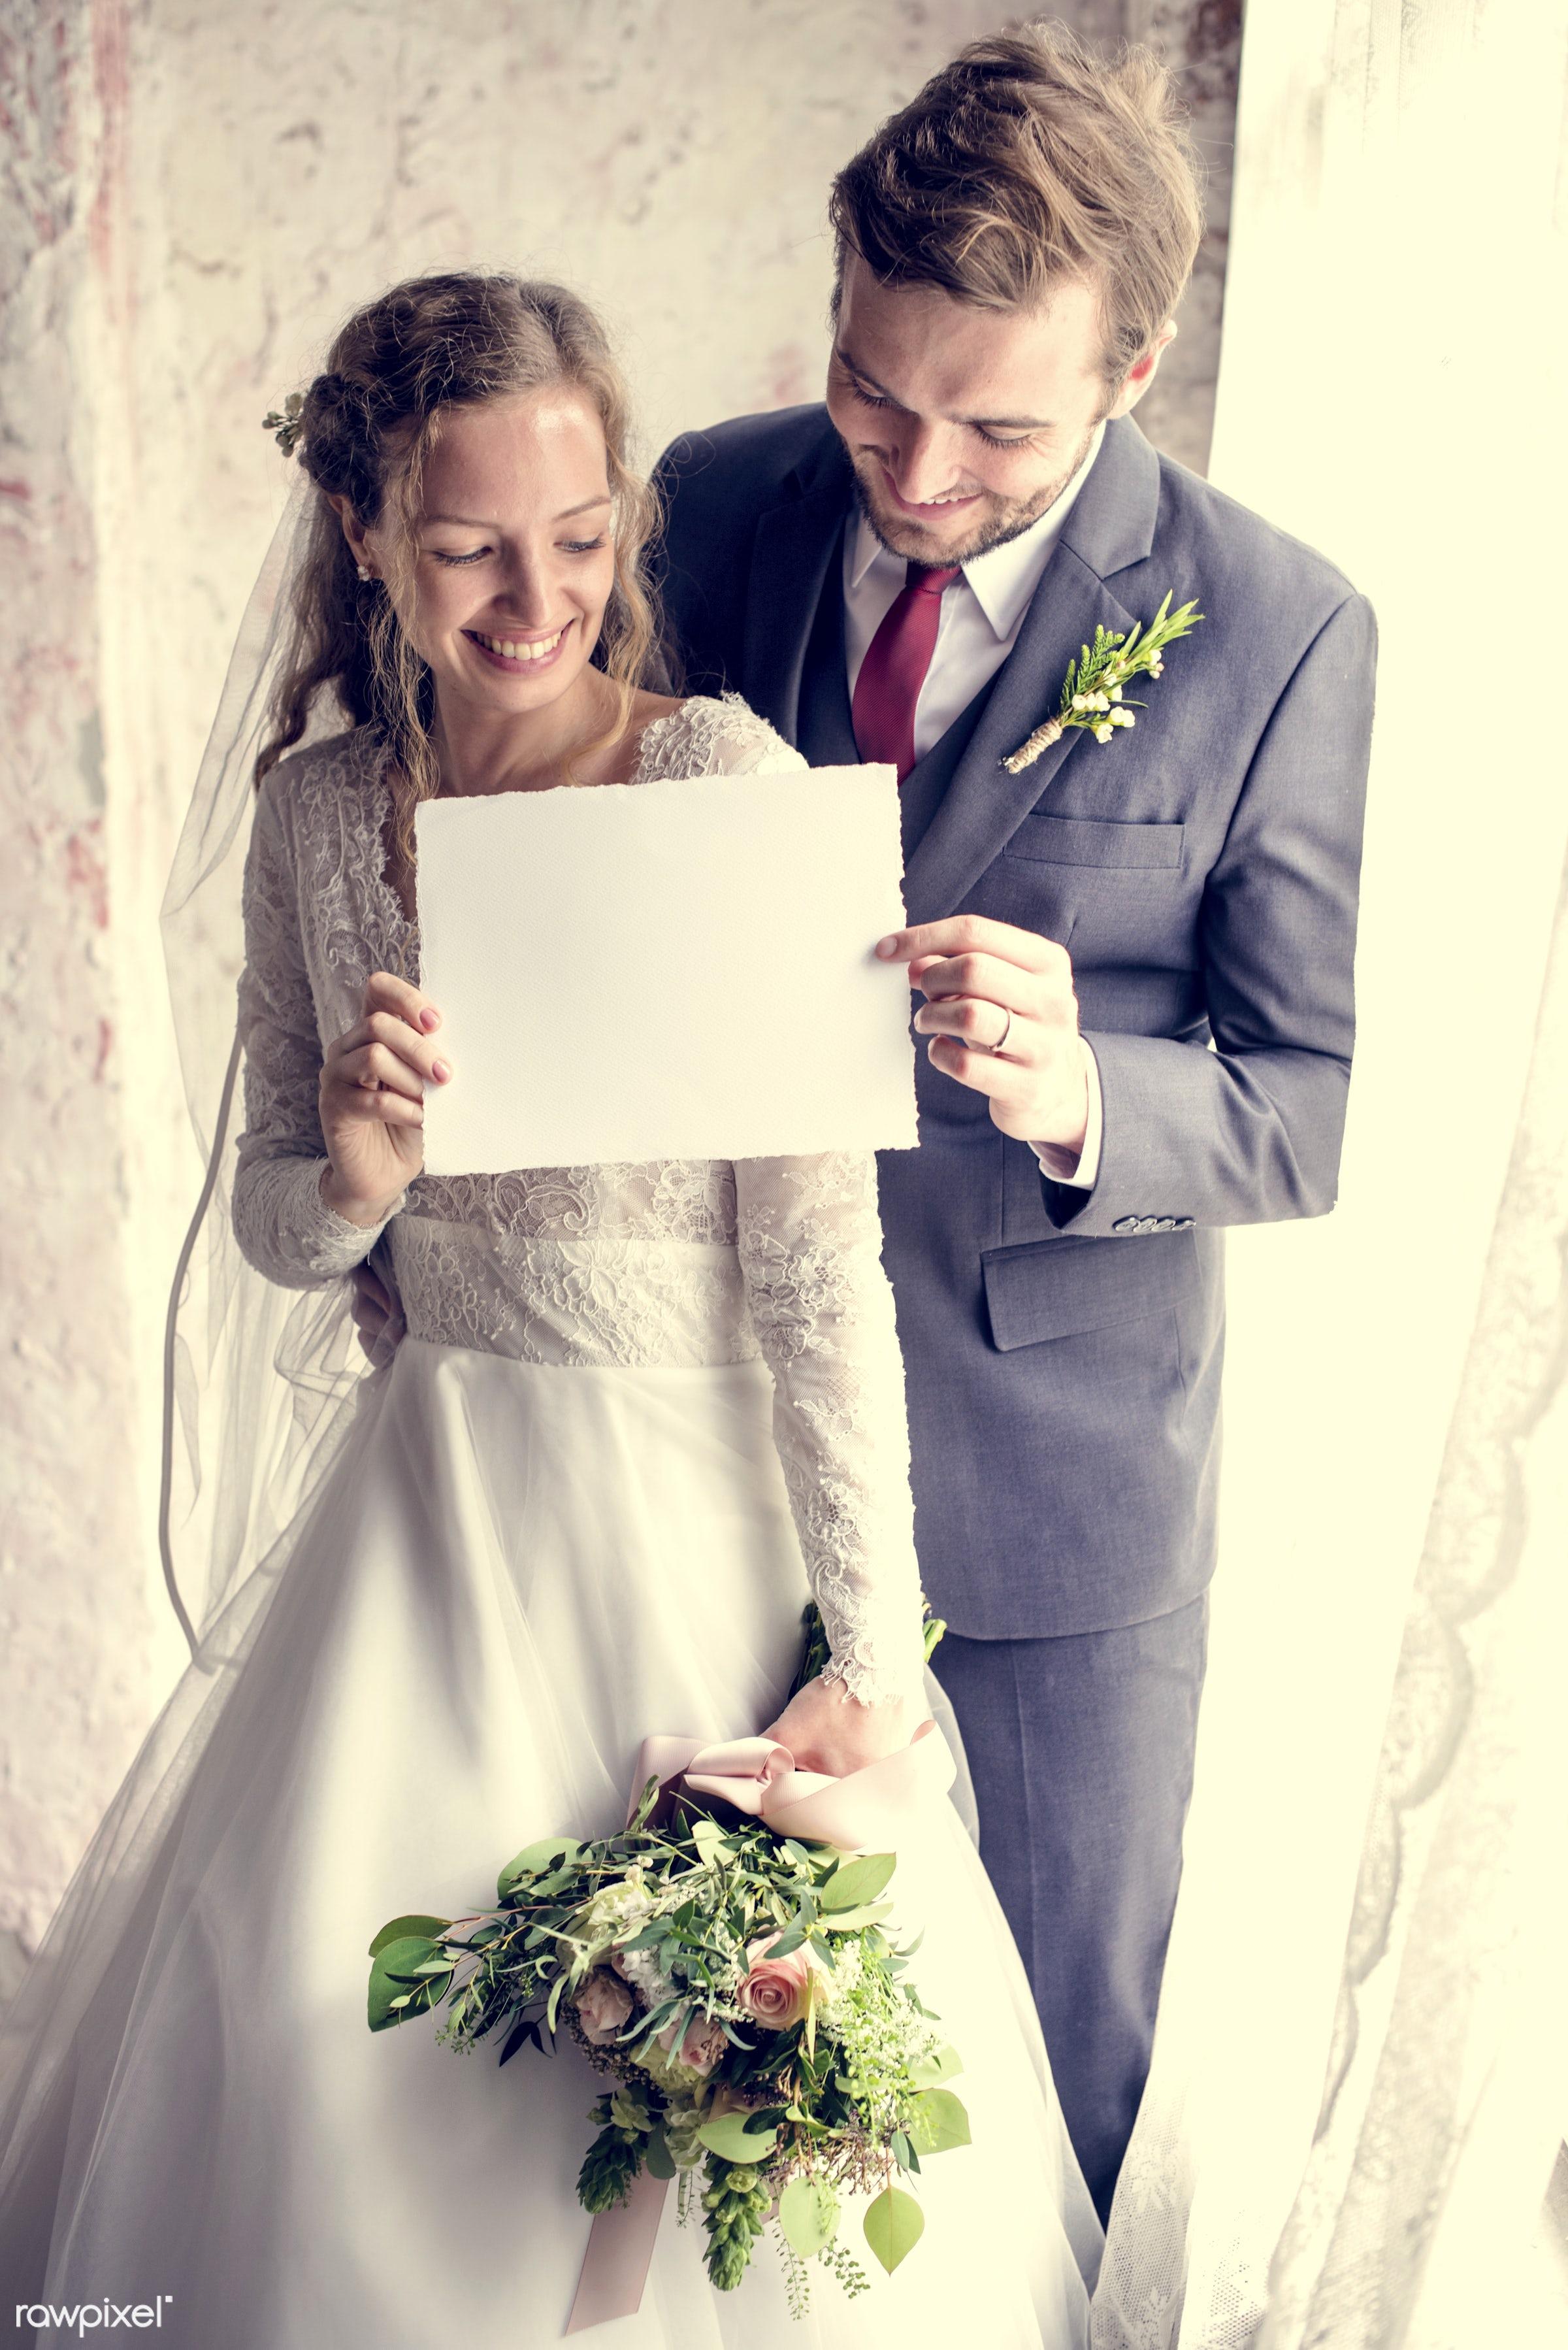 bouquet, person, copy space, holding, bonding, husband, people, placard, love, woman, event, care, couple, soulmate, bride,...